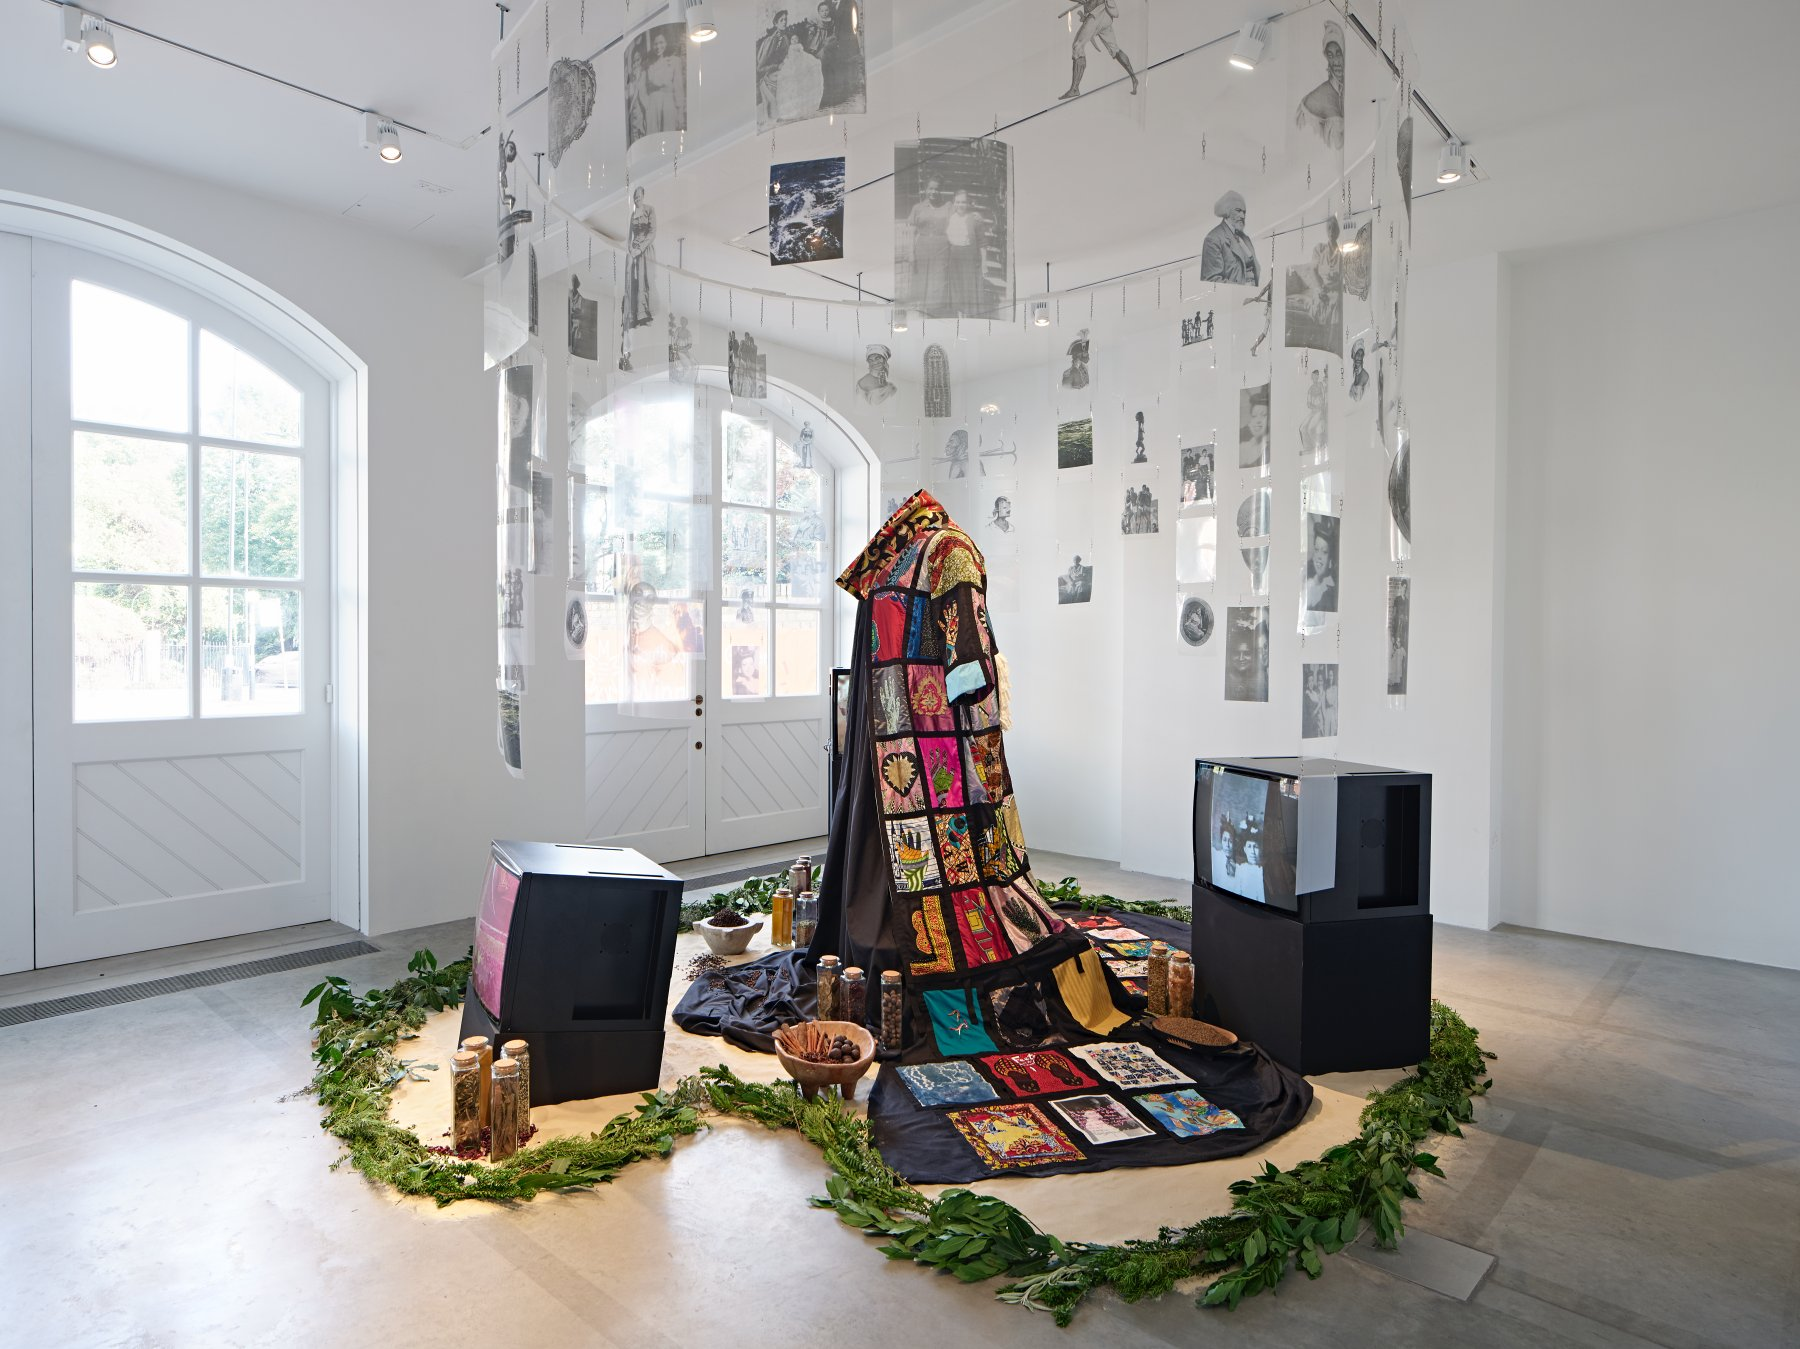 South London Gallery Rita Keegan 1